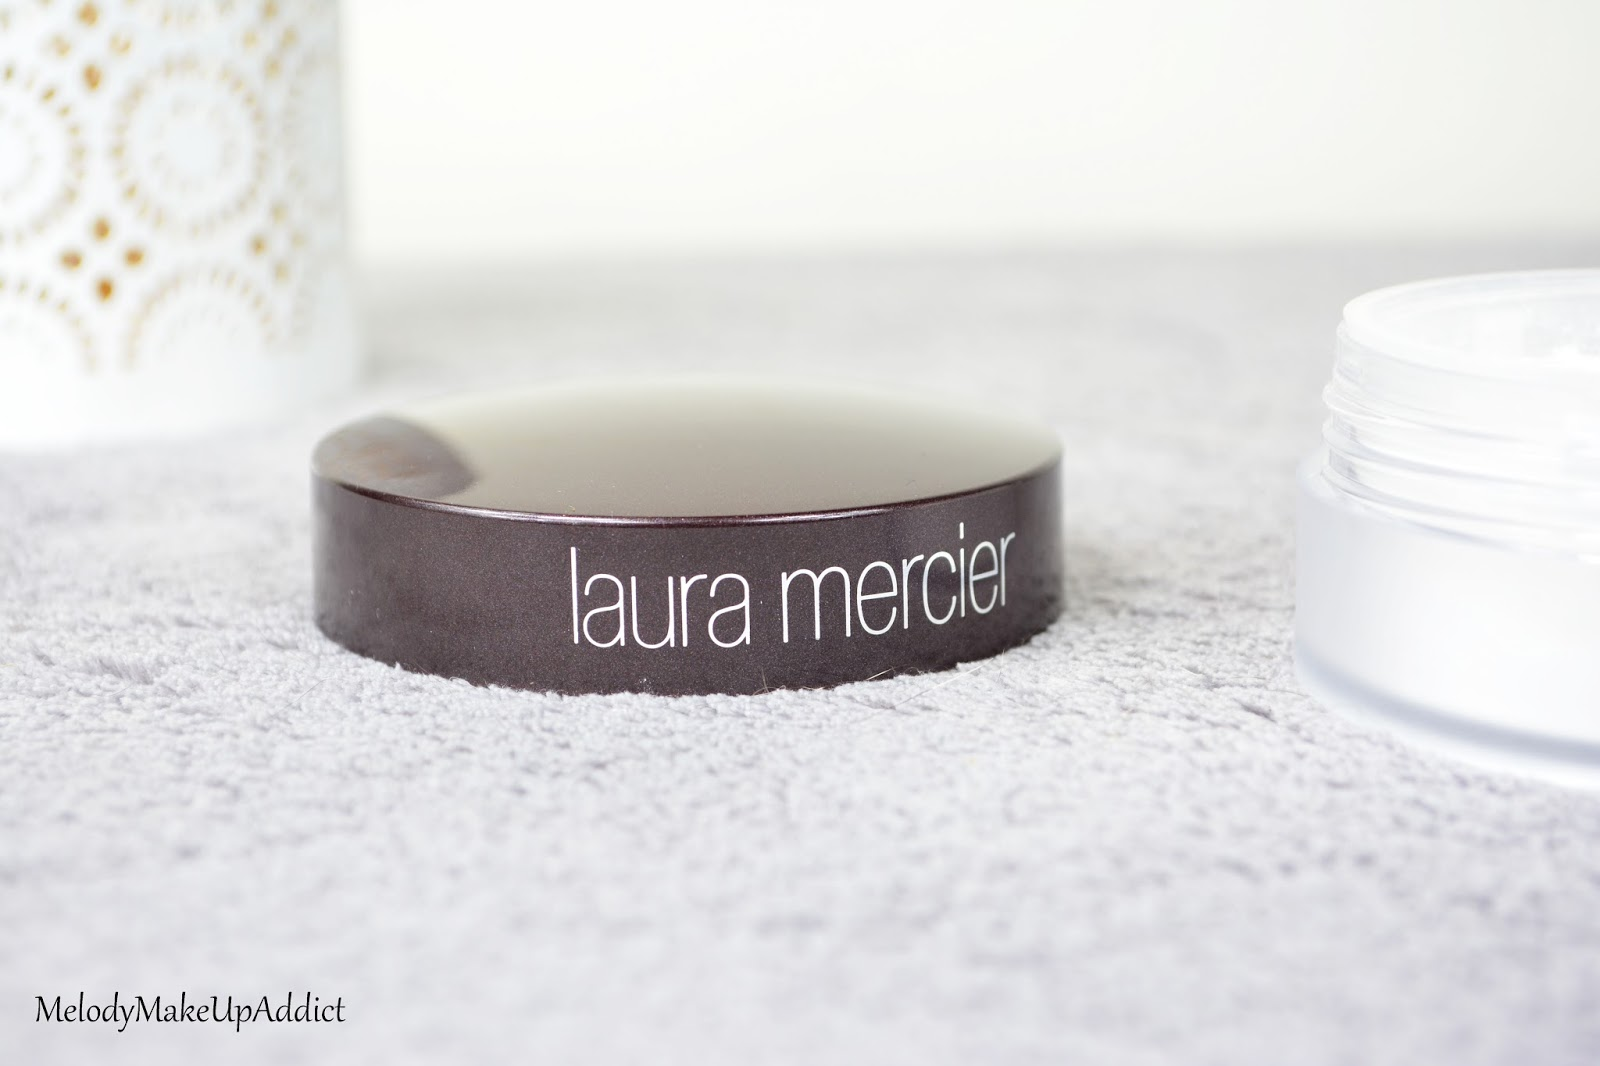 invisible loose setting powder laura mercier